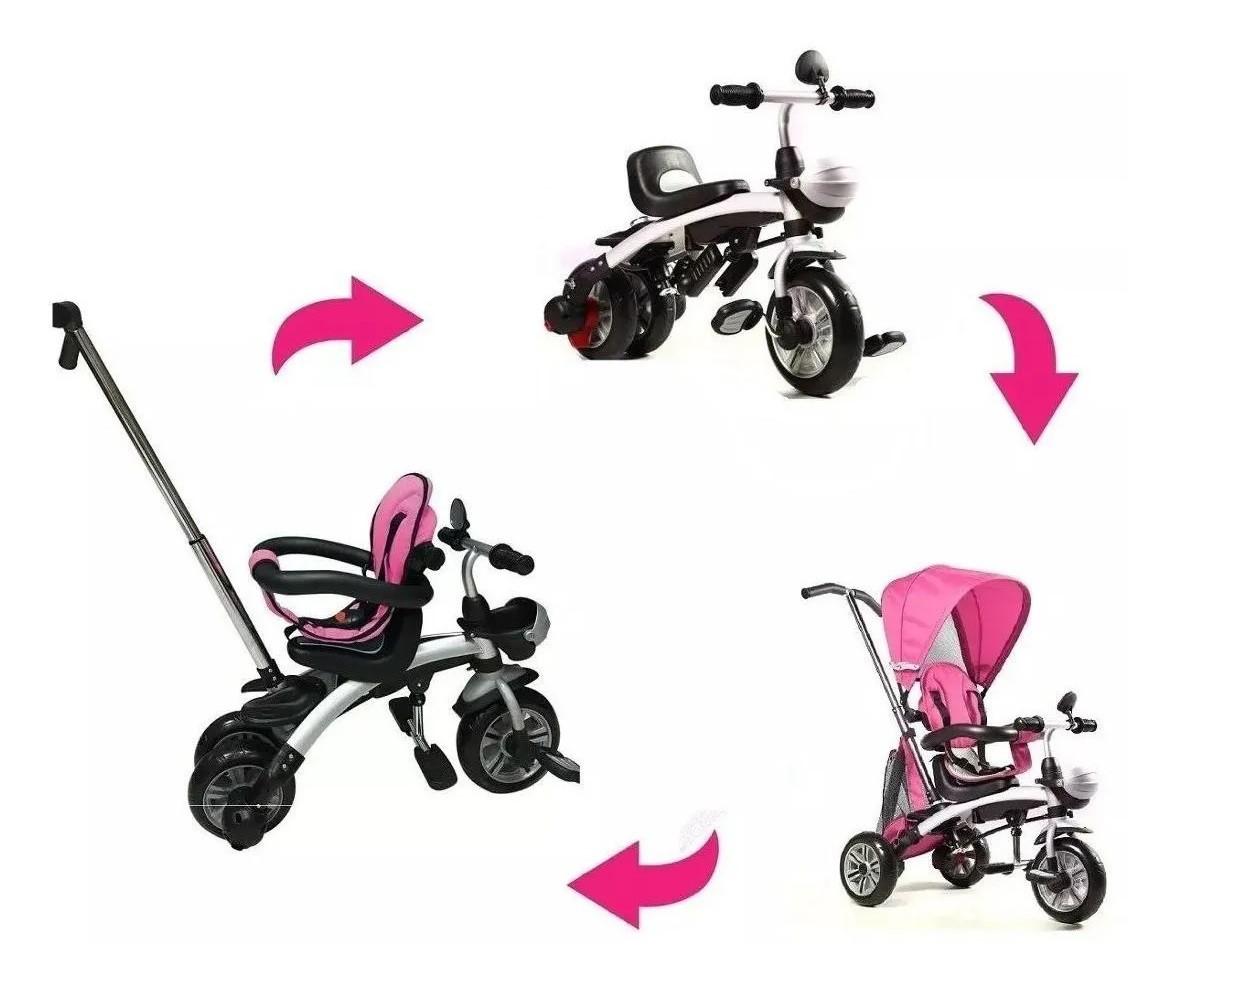 Carrinho Triciclo Bebe Infantil 3 Em 1 Multifuncional Belfix